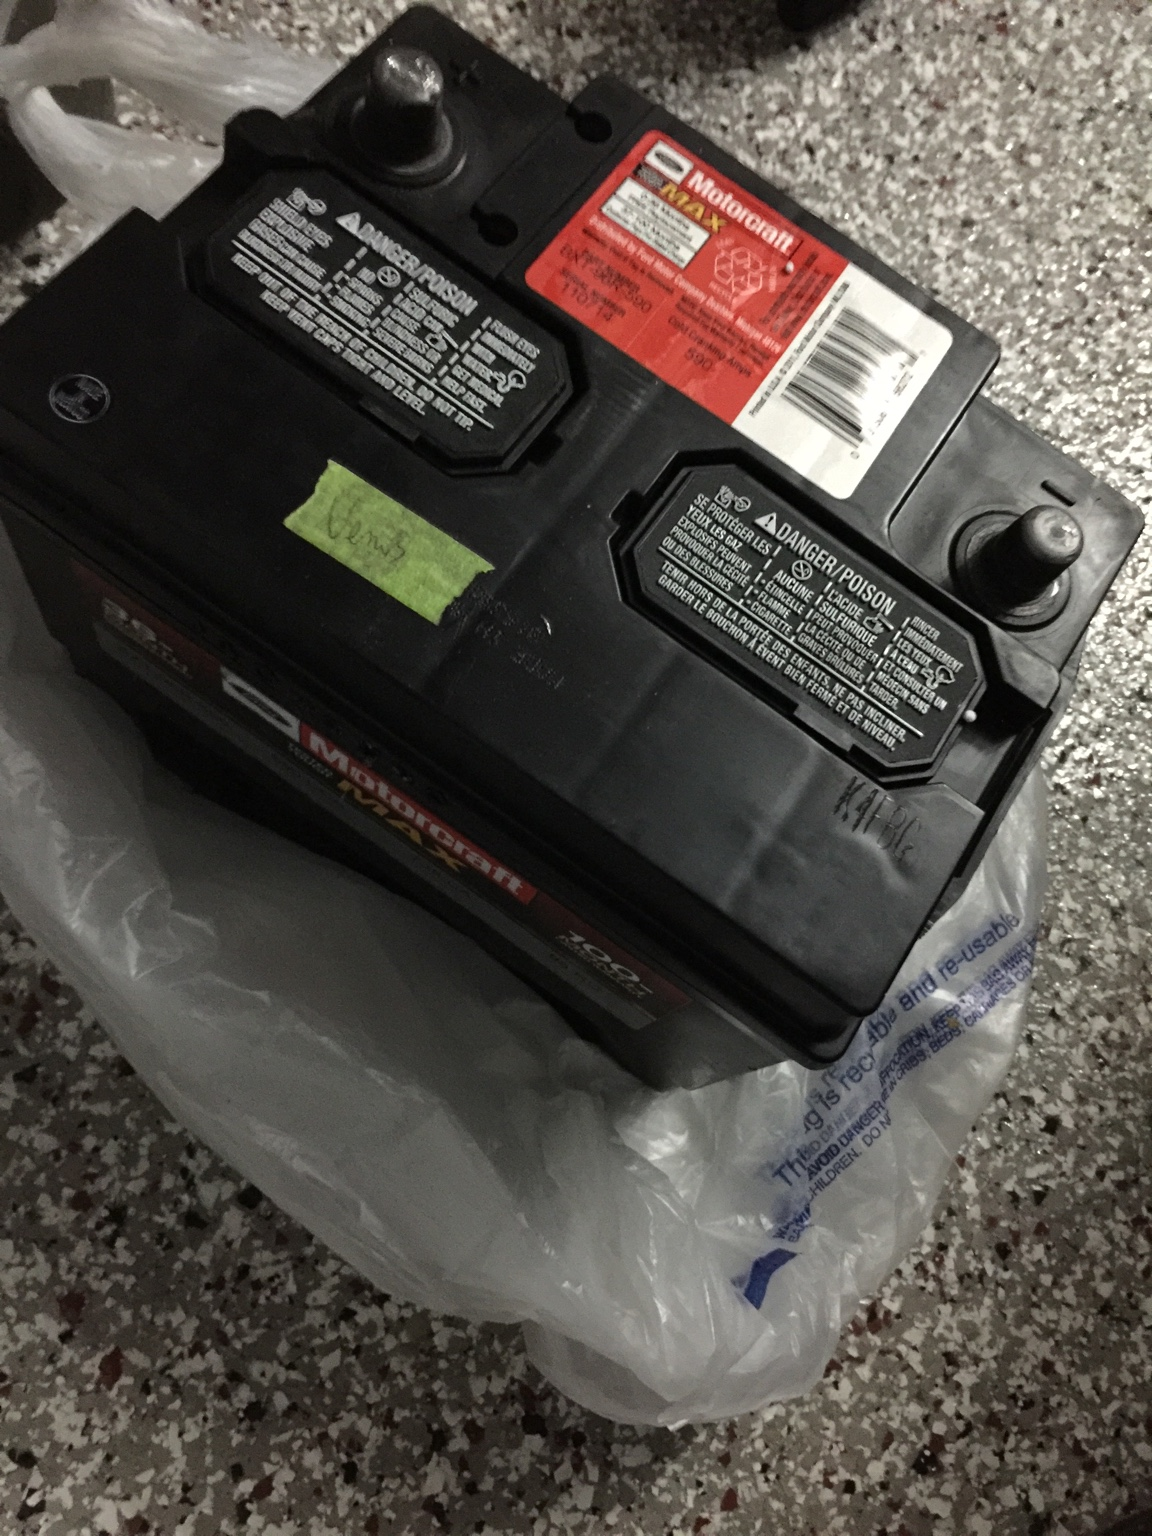 motorcraft battery warranty no receipt crafting. Black Bedroom Furniture Sets. Home Design Ideas